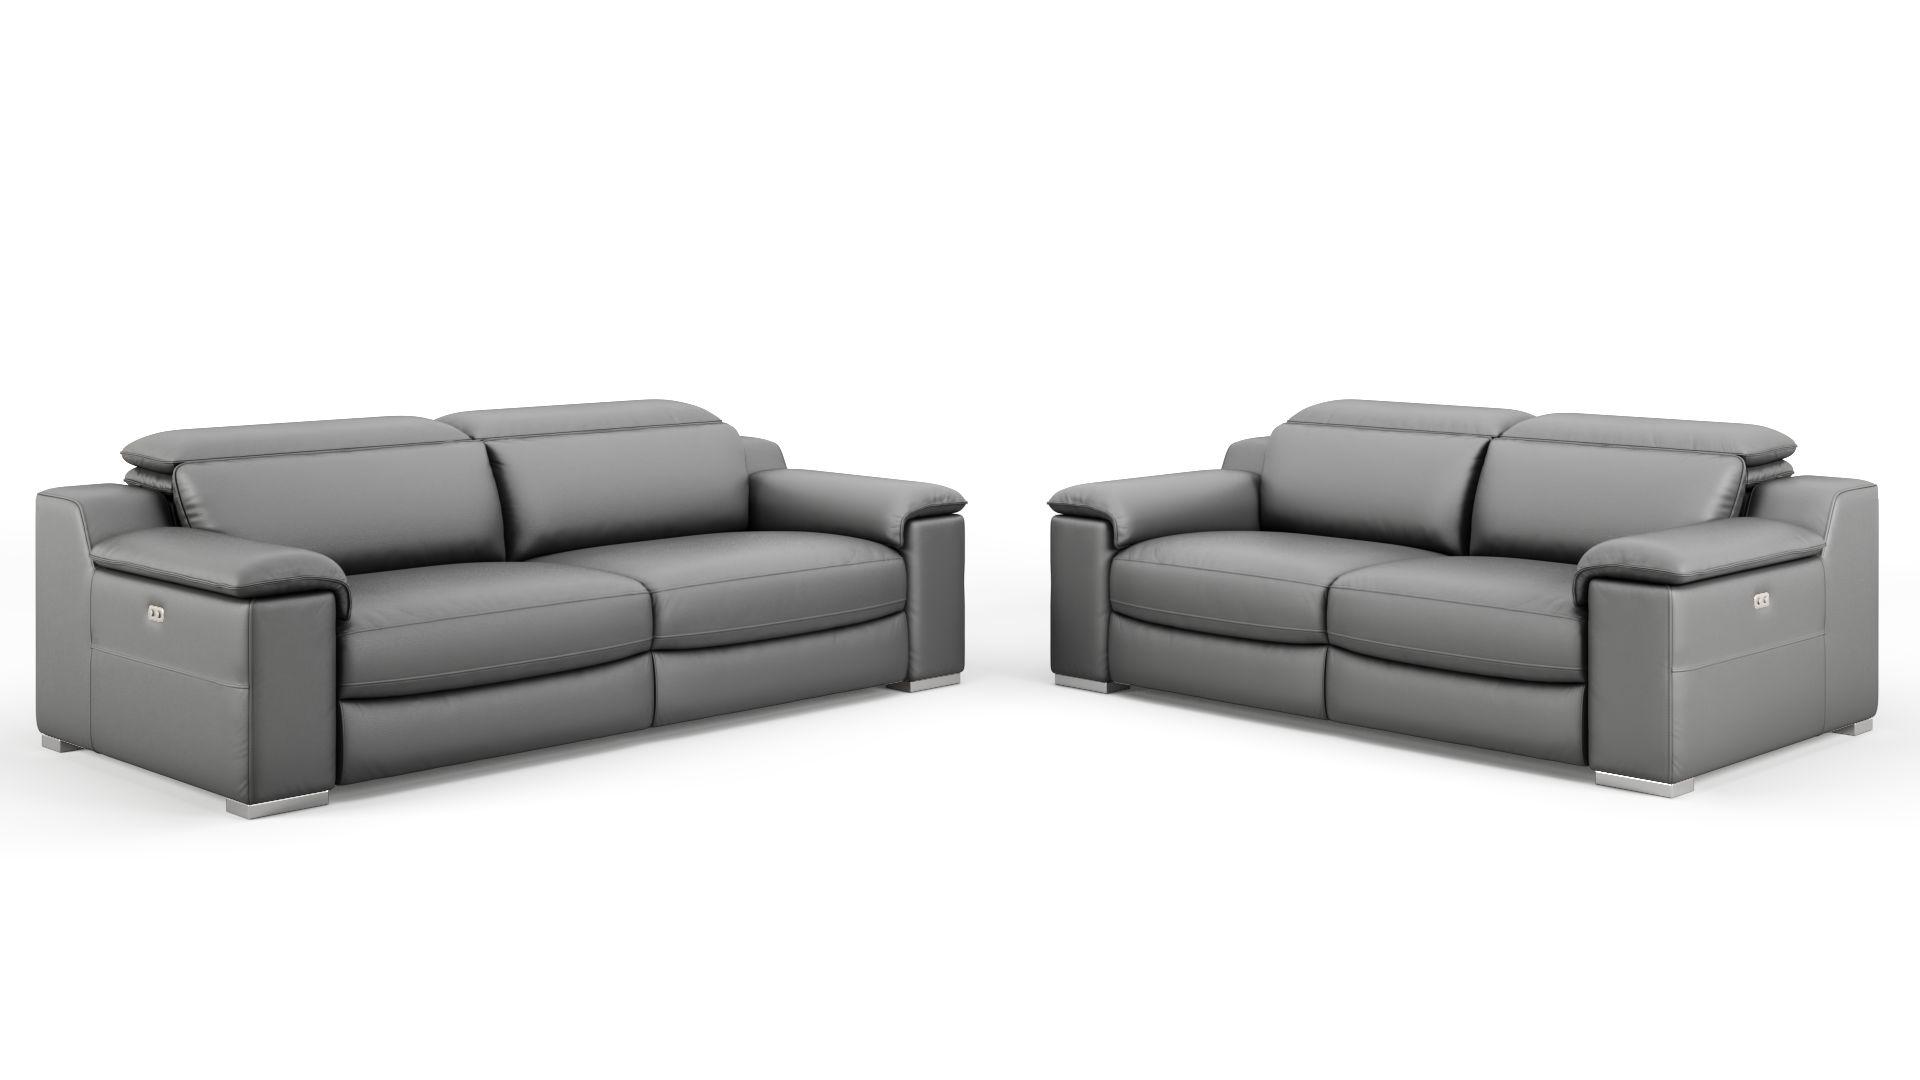 Leder 2-Sitzer Sofa MACELLO